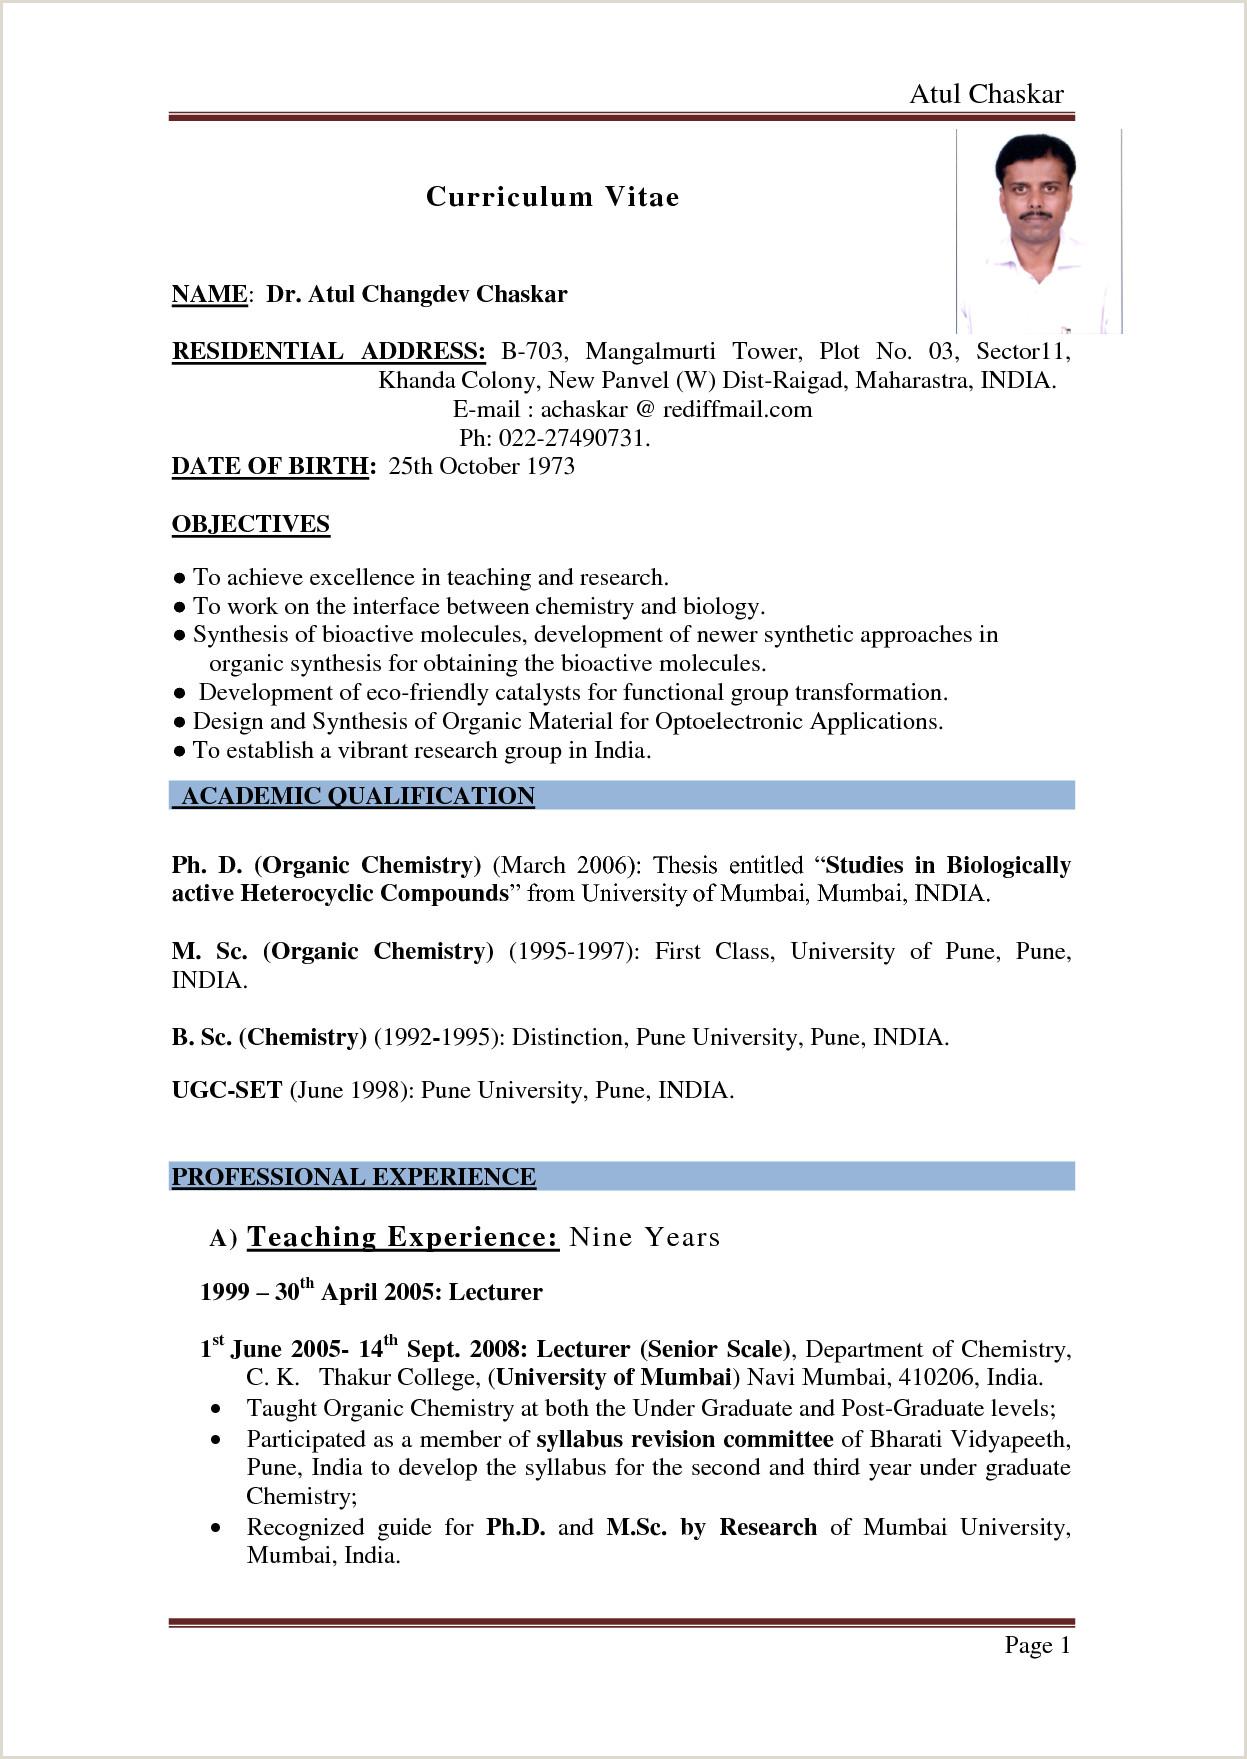 Fresher Resume format Pdf India Part 2 Resume format Examples